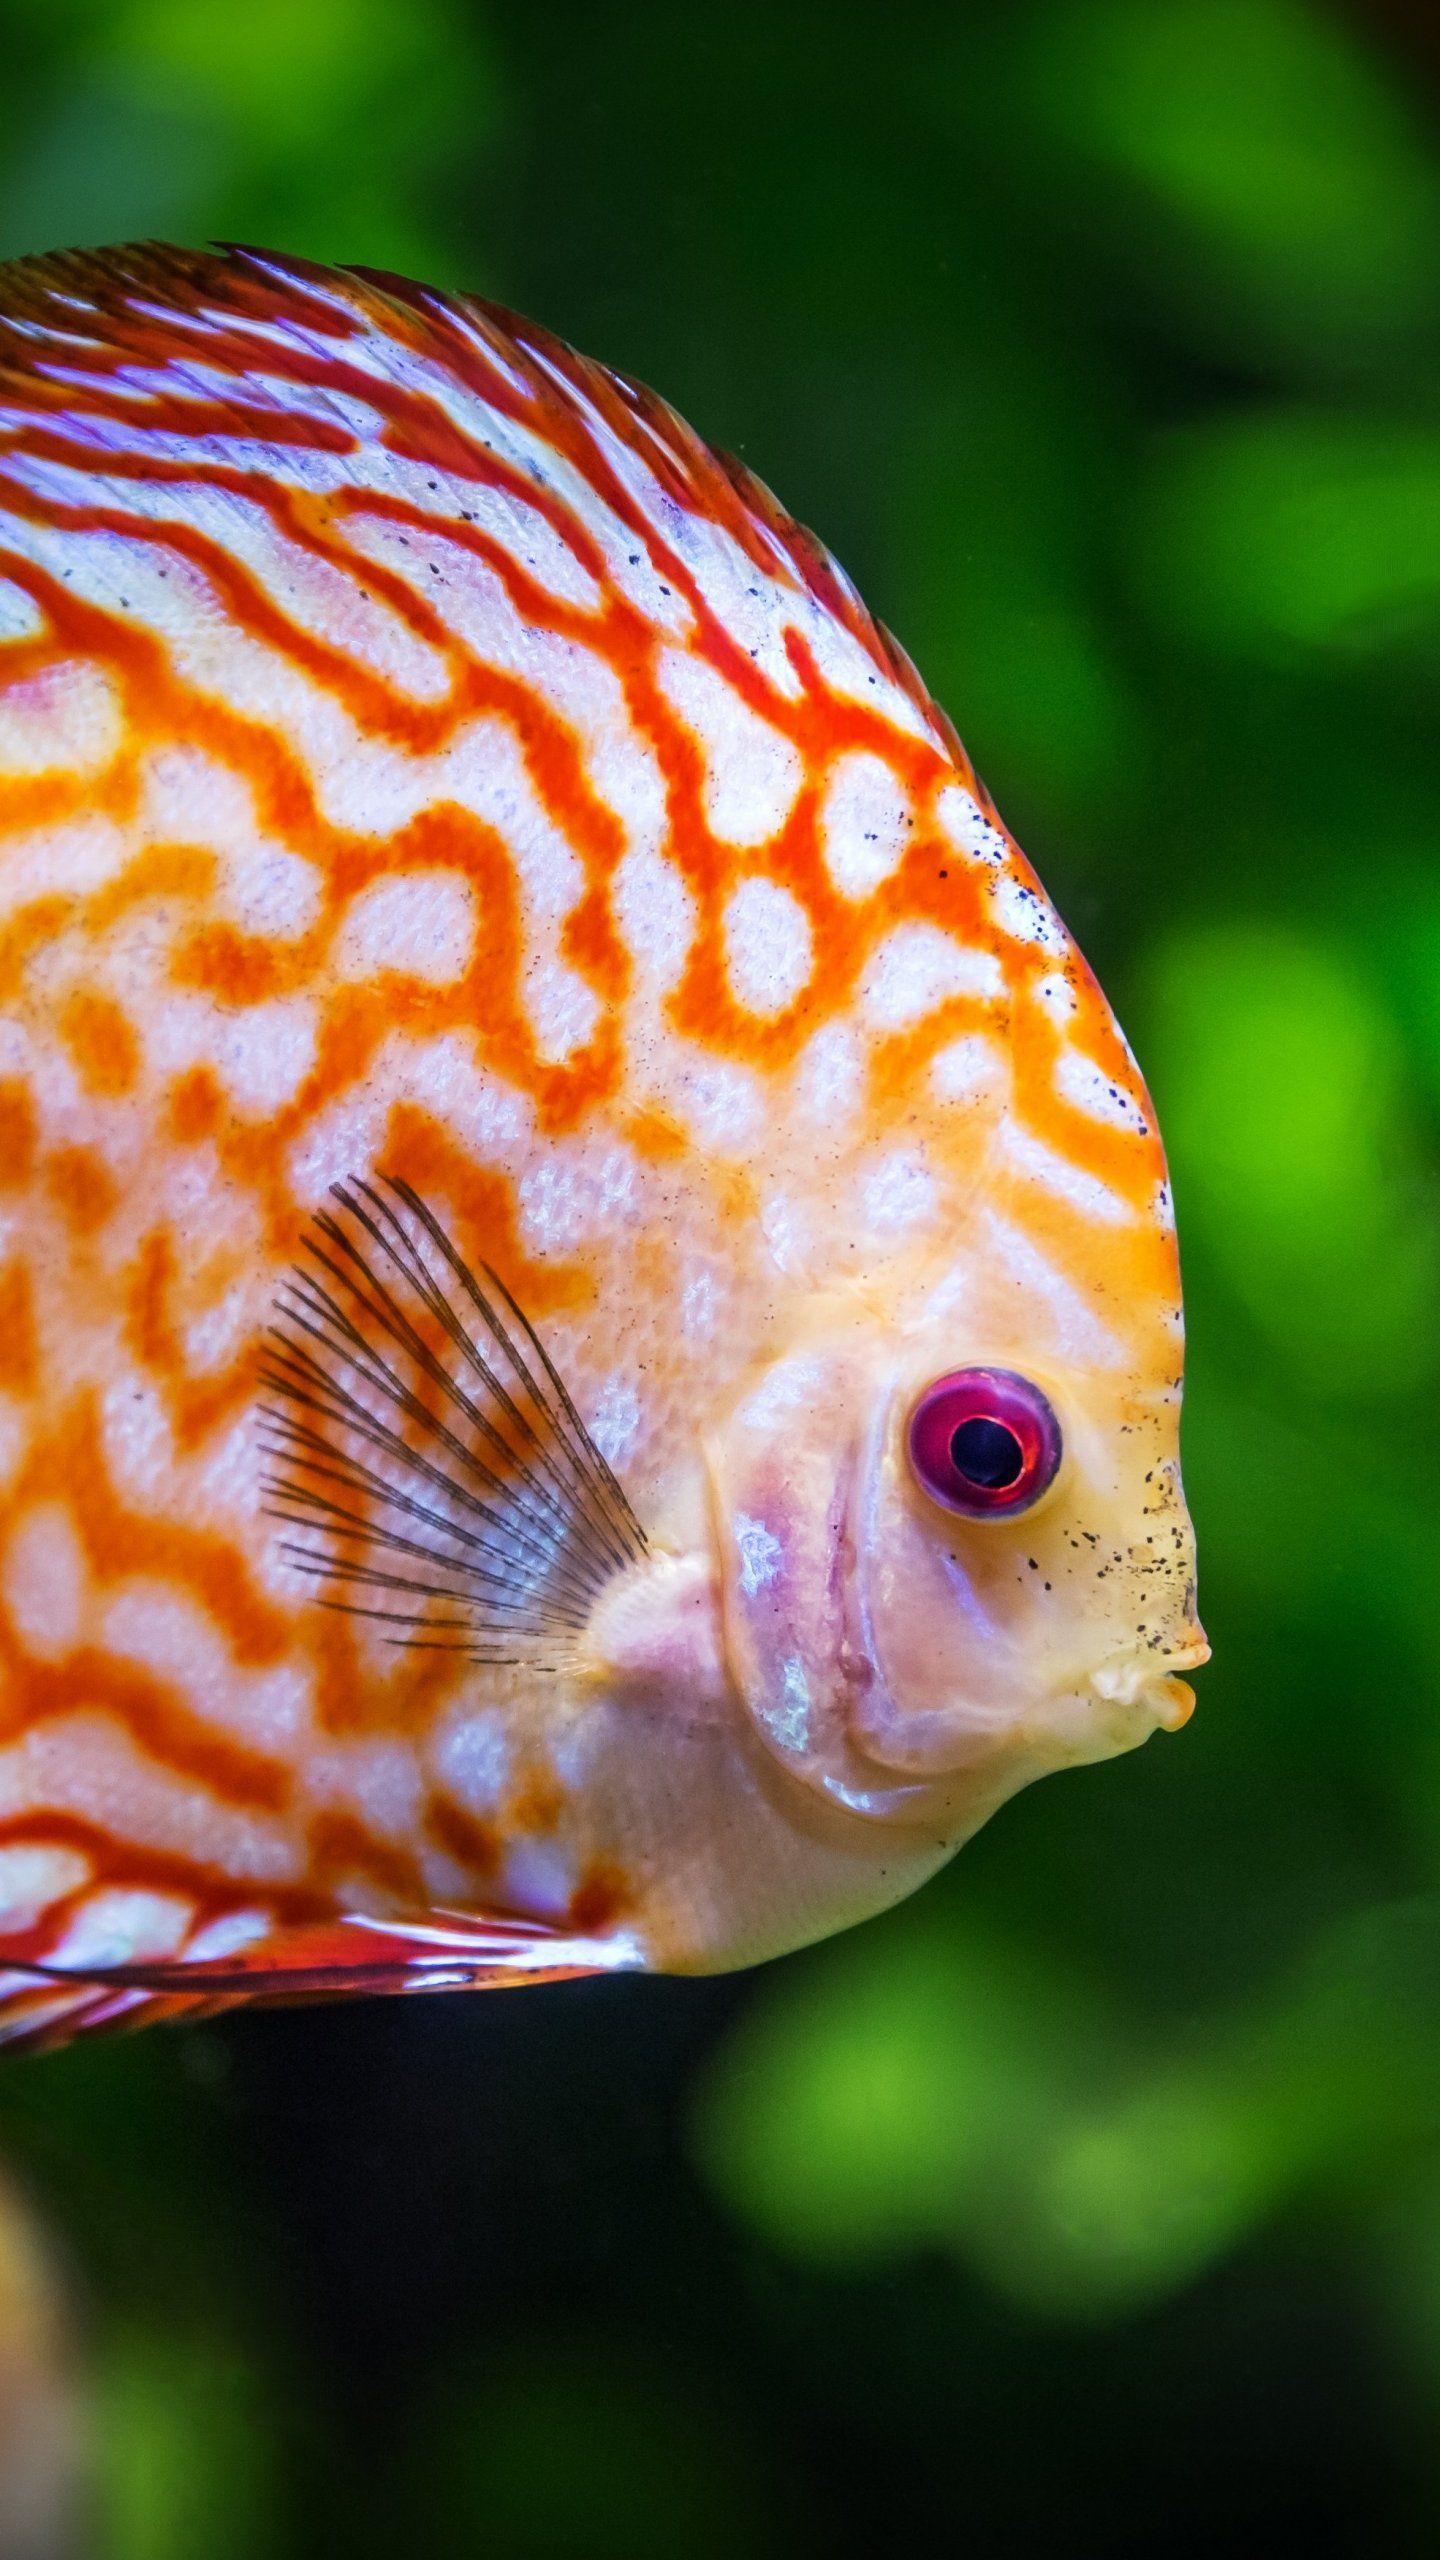 Discus Fish Underwater Wallpaper iPhone, Android